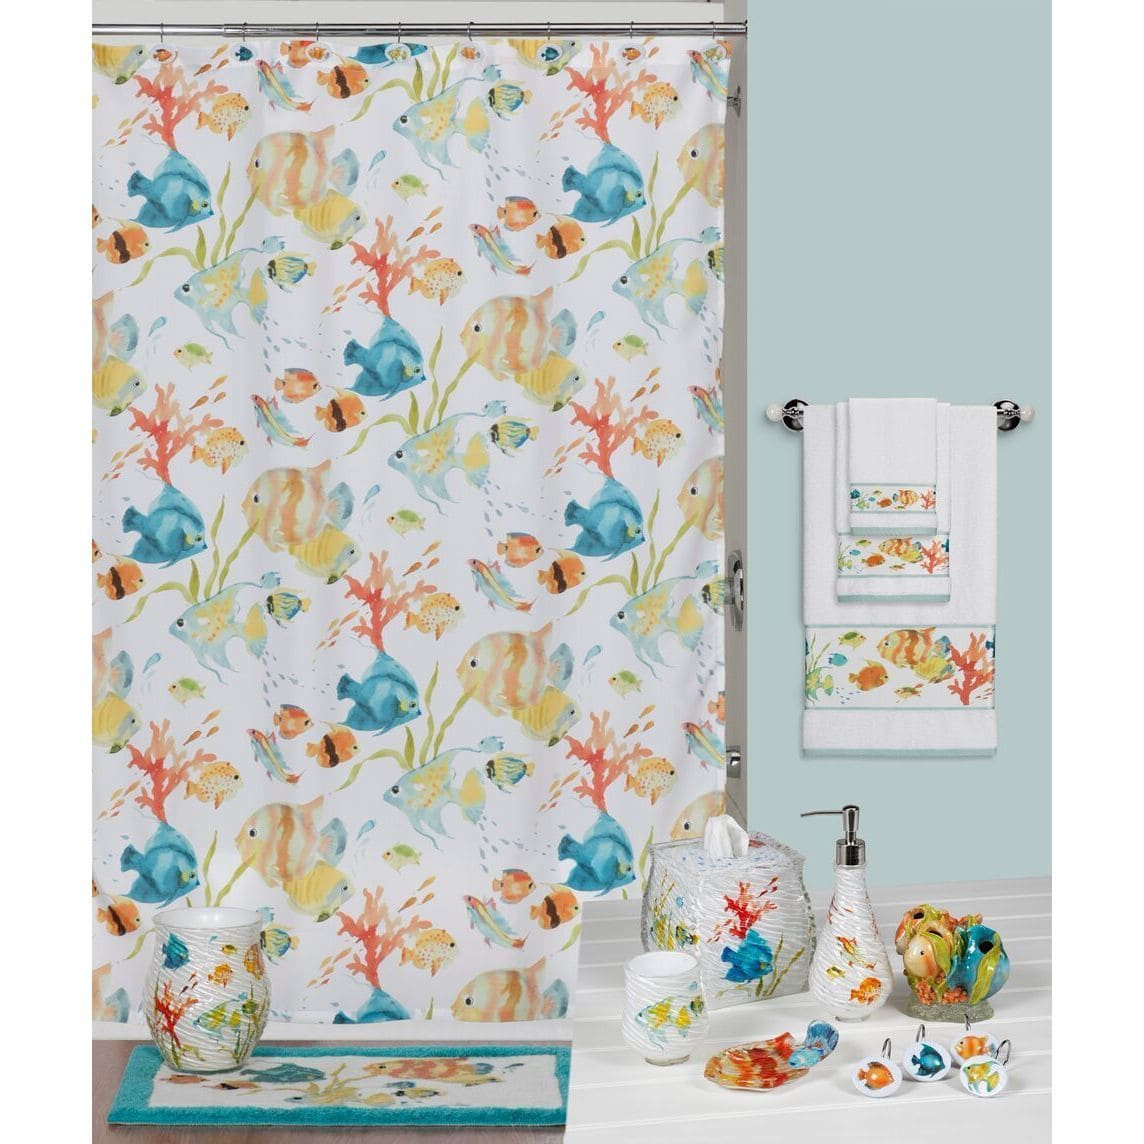 New in Box Creative Bath 12 Tropical fish shower curtain hooks Multi-color